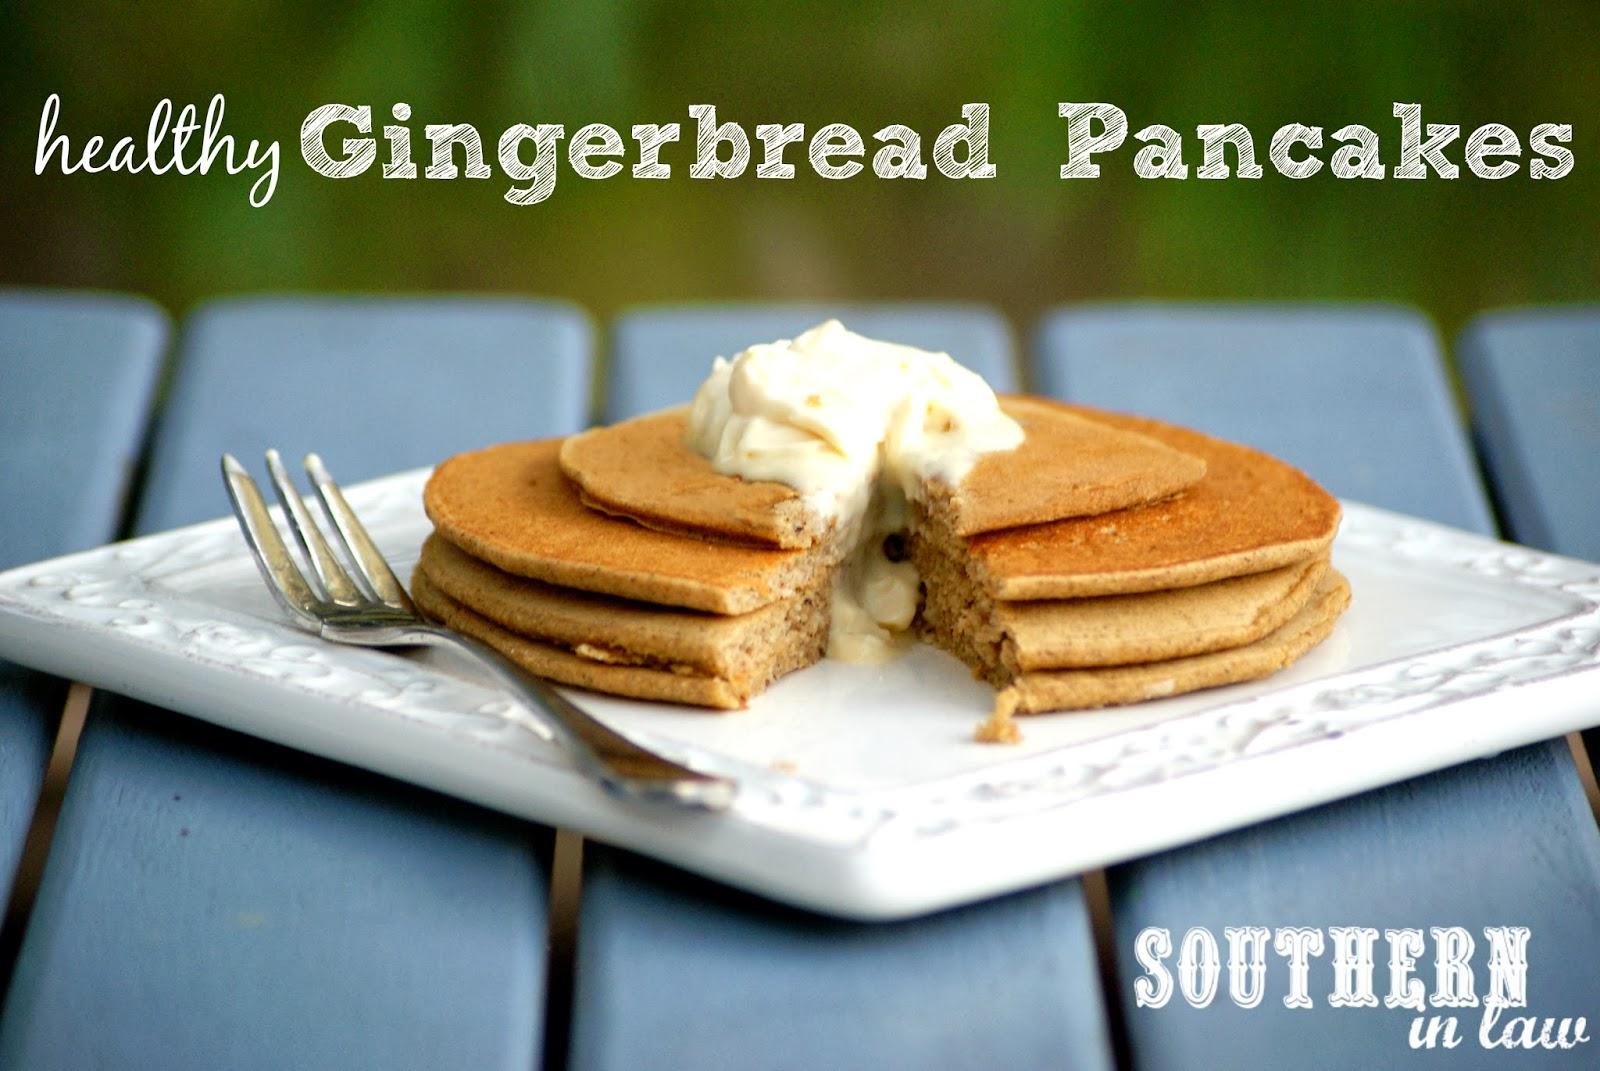 Healthy Gingerbread Buckwheat Pancakes Recipe - Gluten Free, Low Fat, Sugar Free